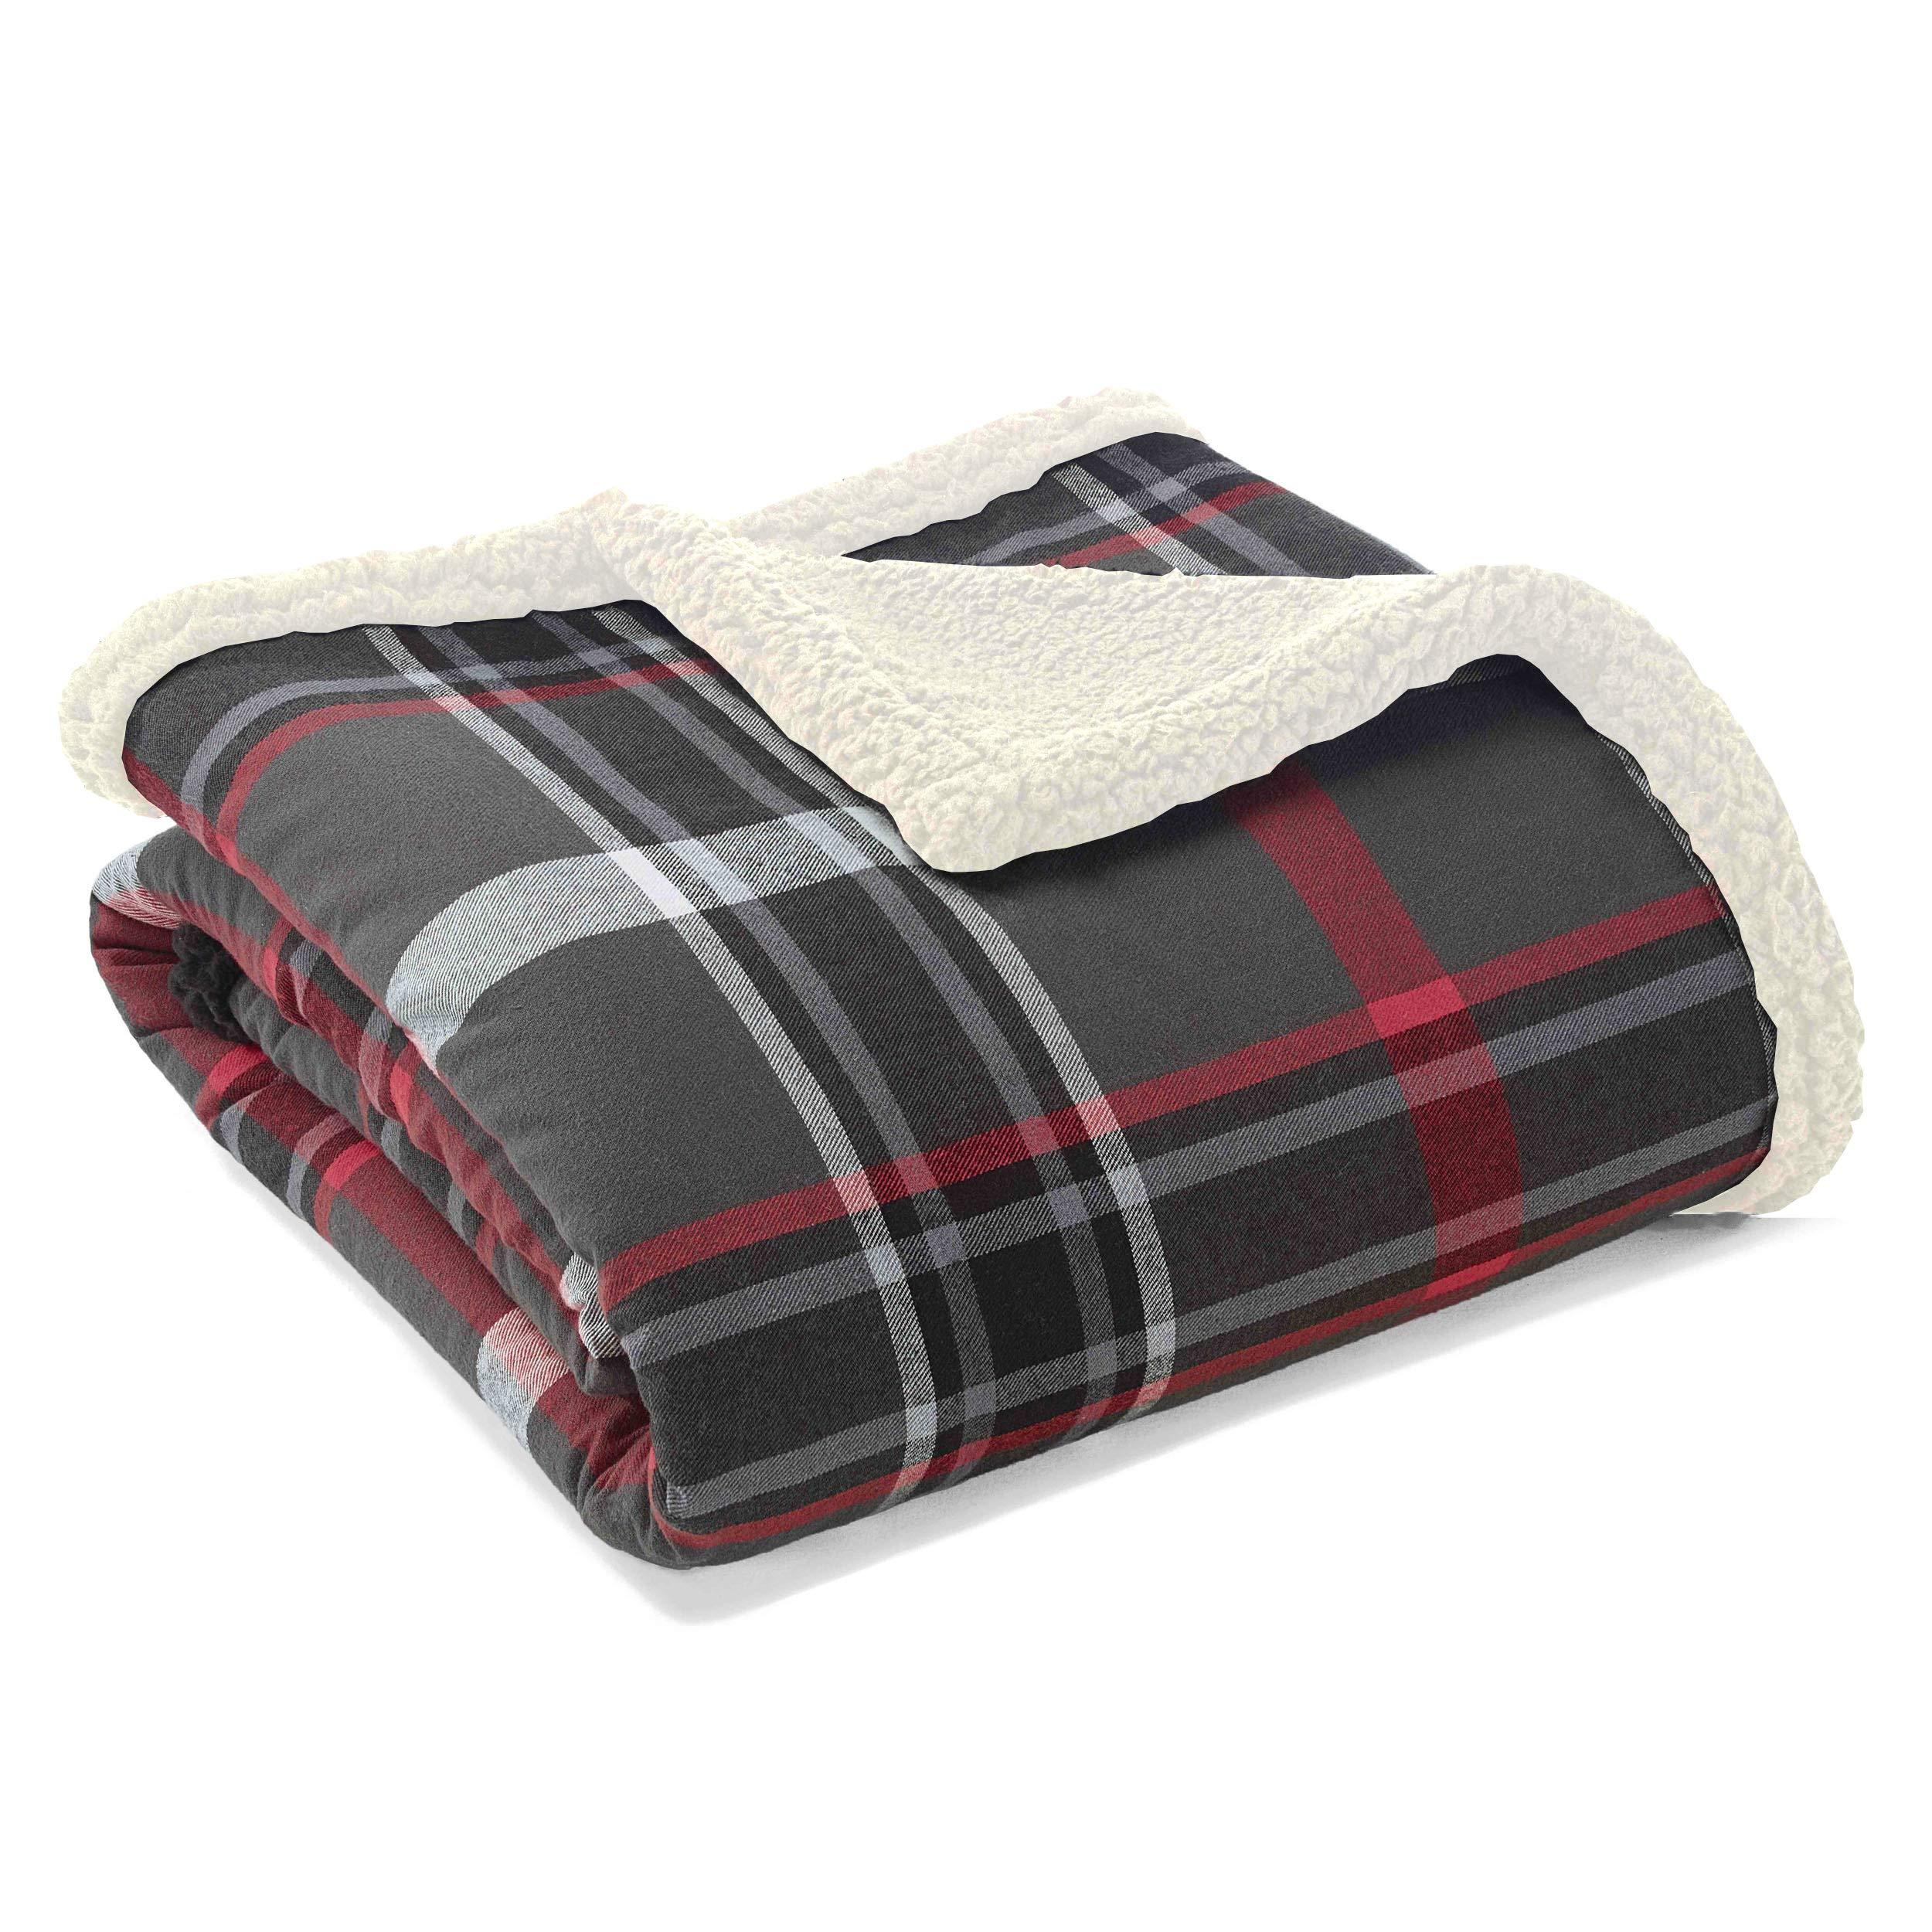 "Eddie Bauer Flannel Winslow Sherpa Fleece Throw, 50"" x 60"", Grey"